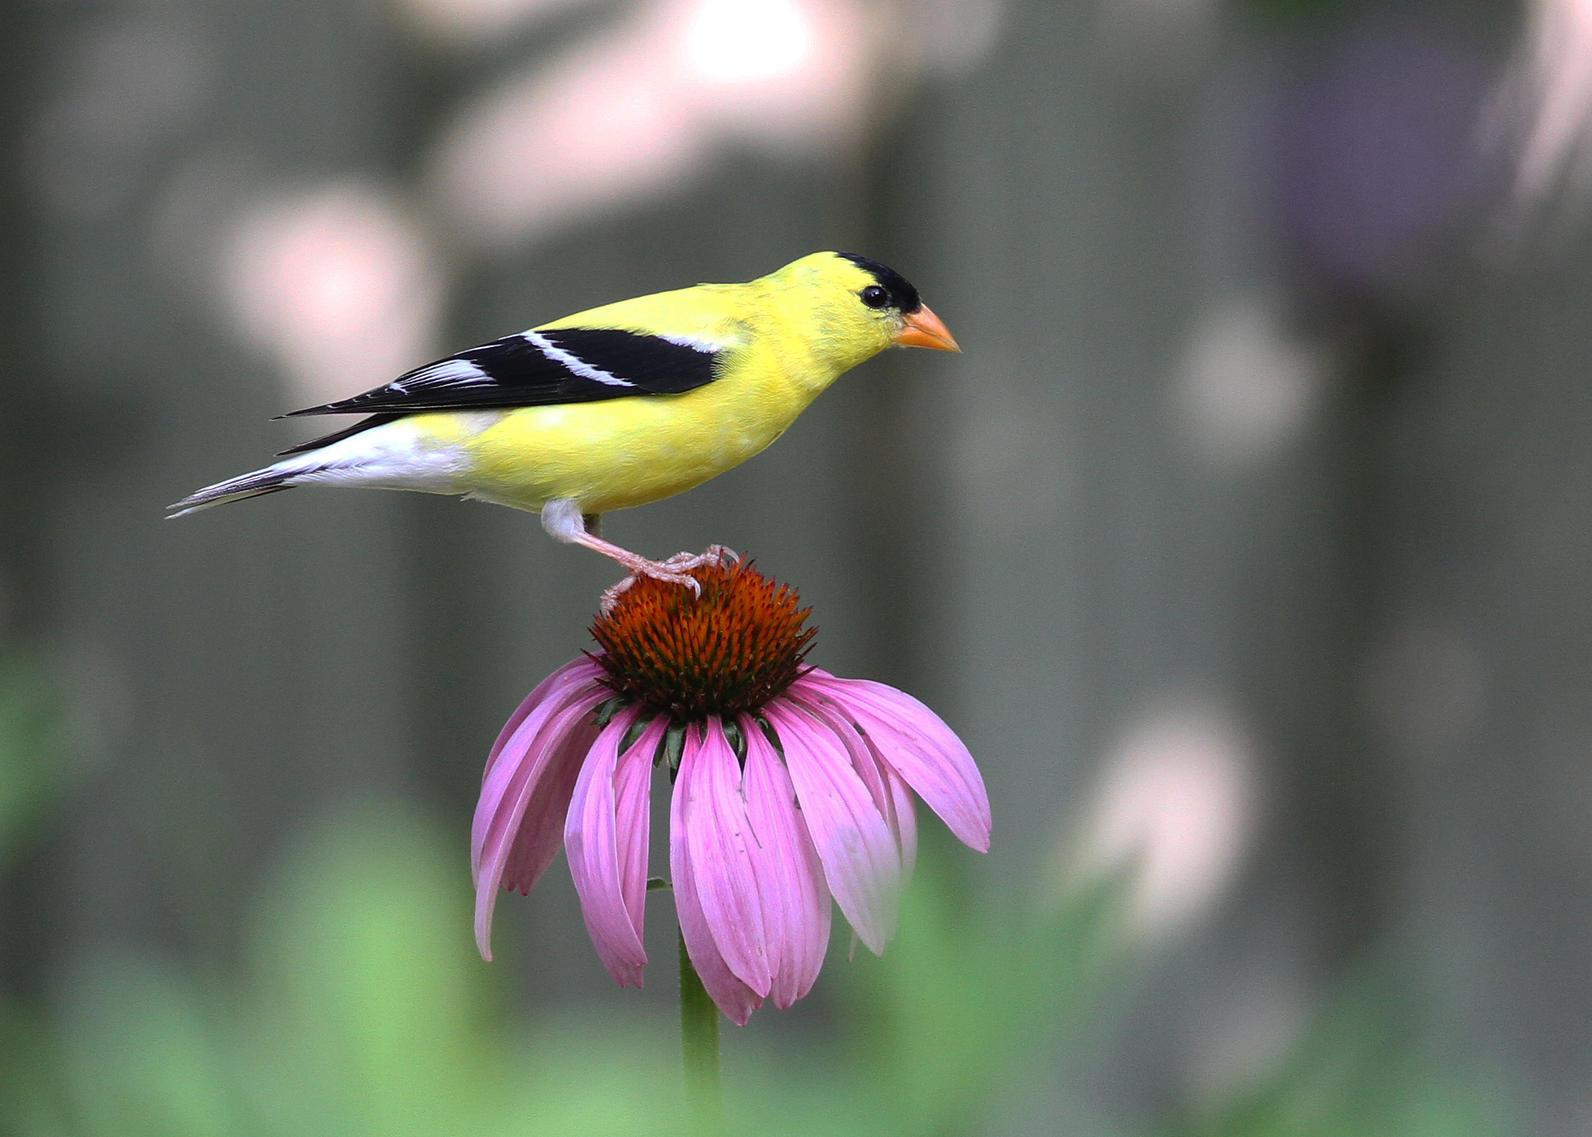 echinacea purpurea and american goldfinch by will stuart